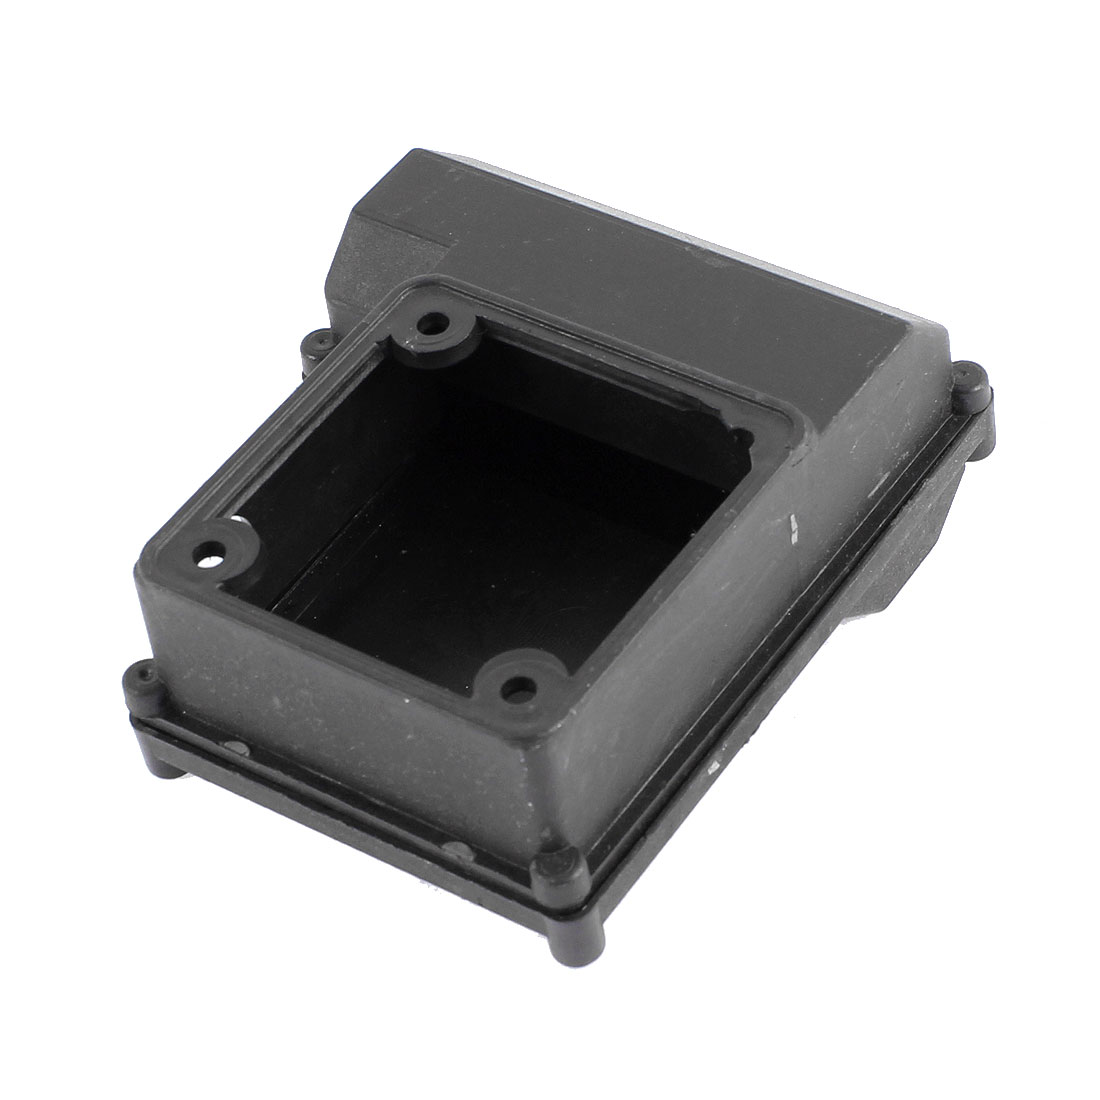 Black Plastic Electric Circuit Connect Junction Box 115mm x 100mm